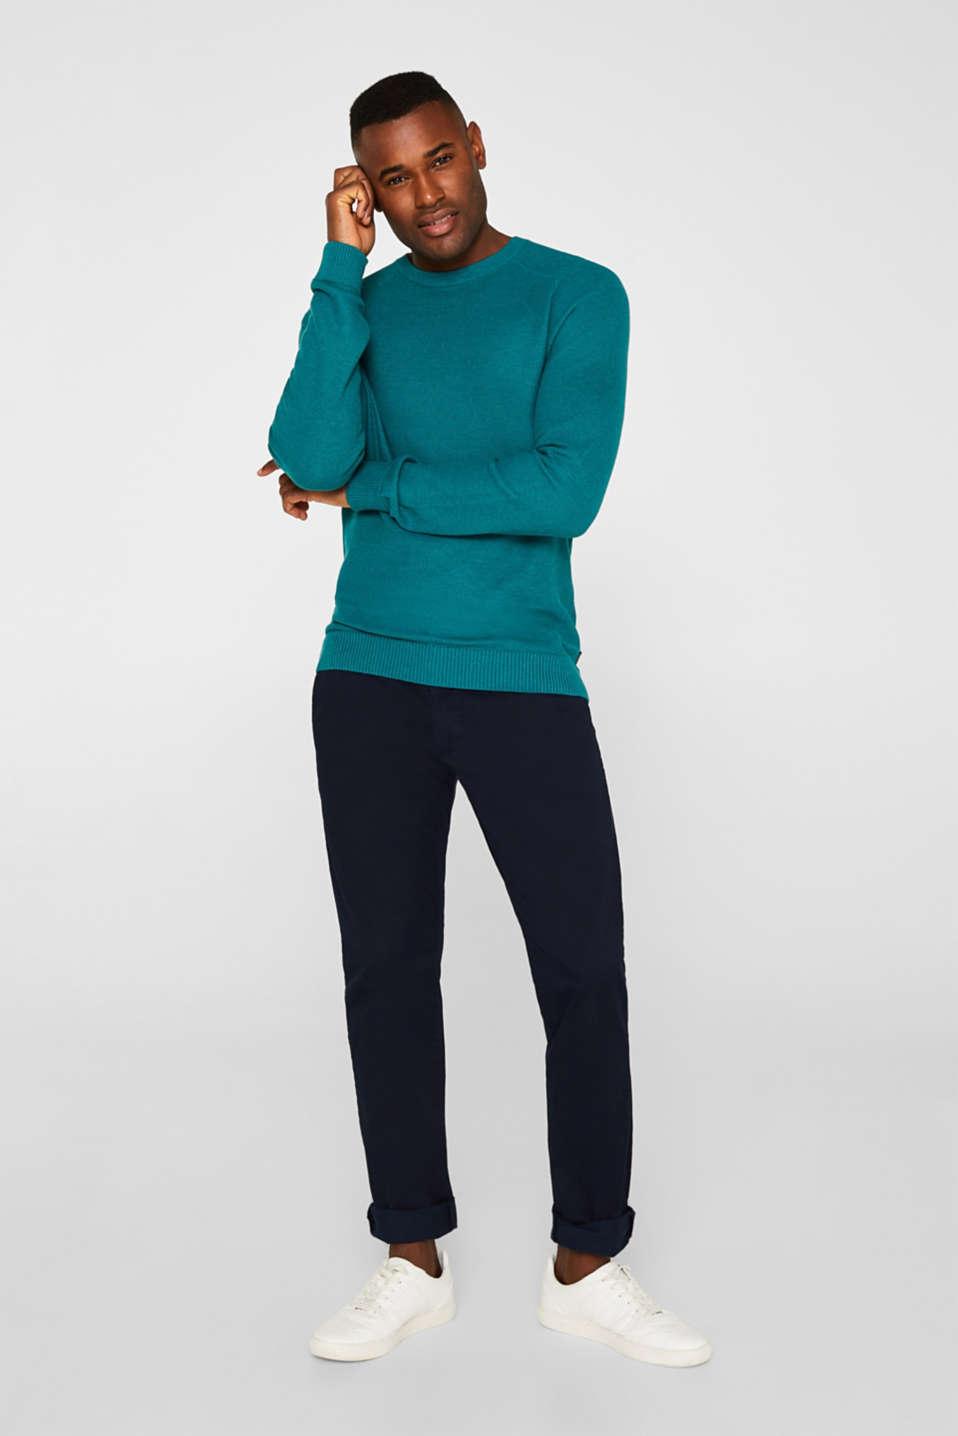 Textured jumper made of 100% cotton, TEAL BLUE 5, detail image number 1